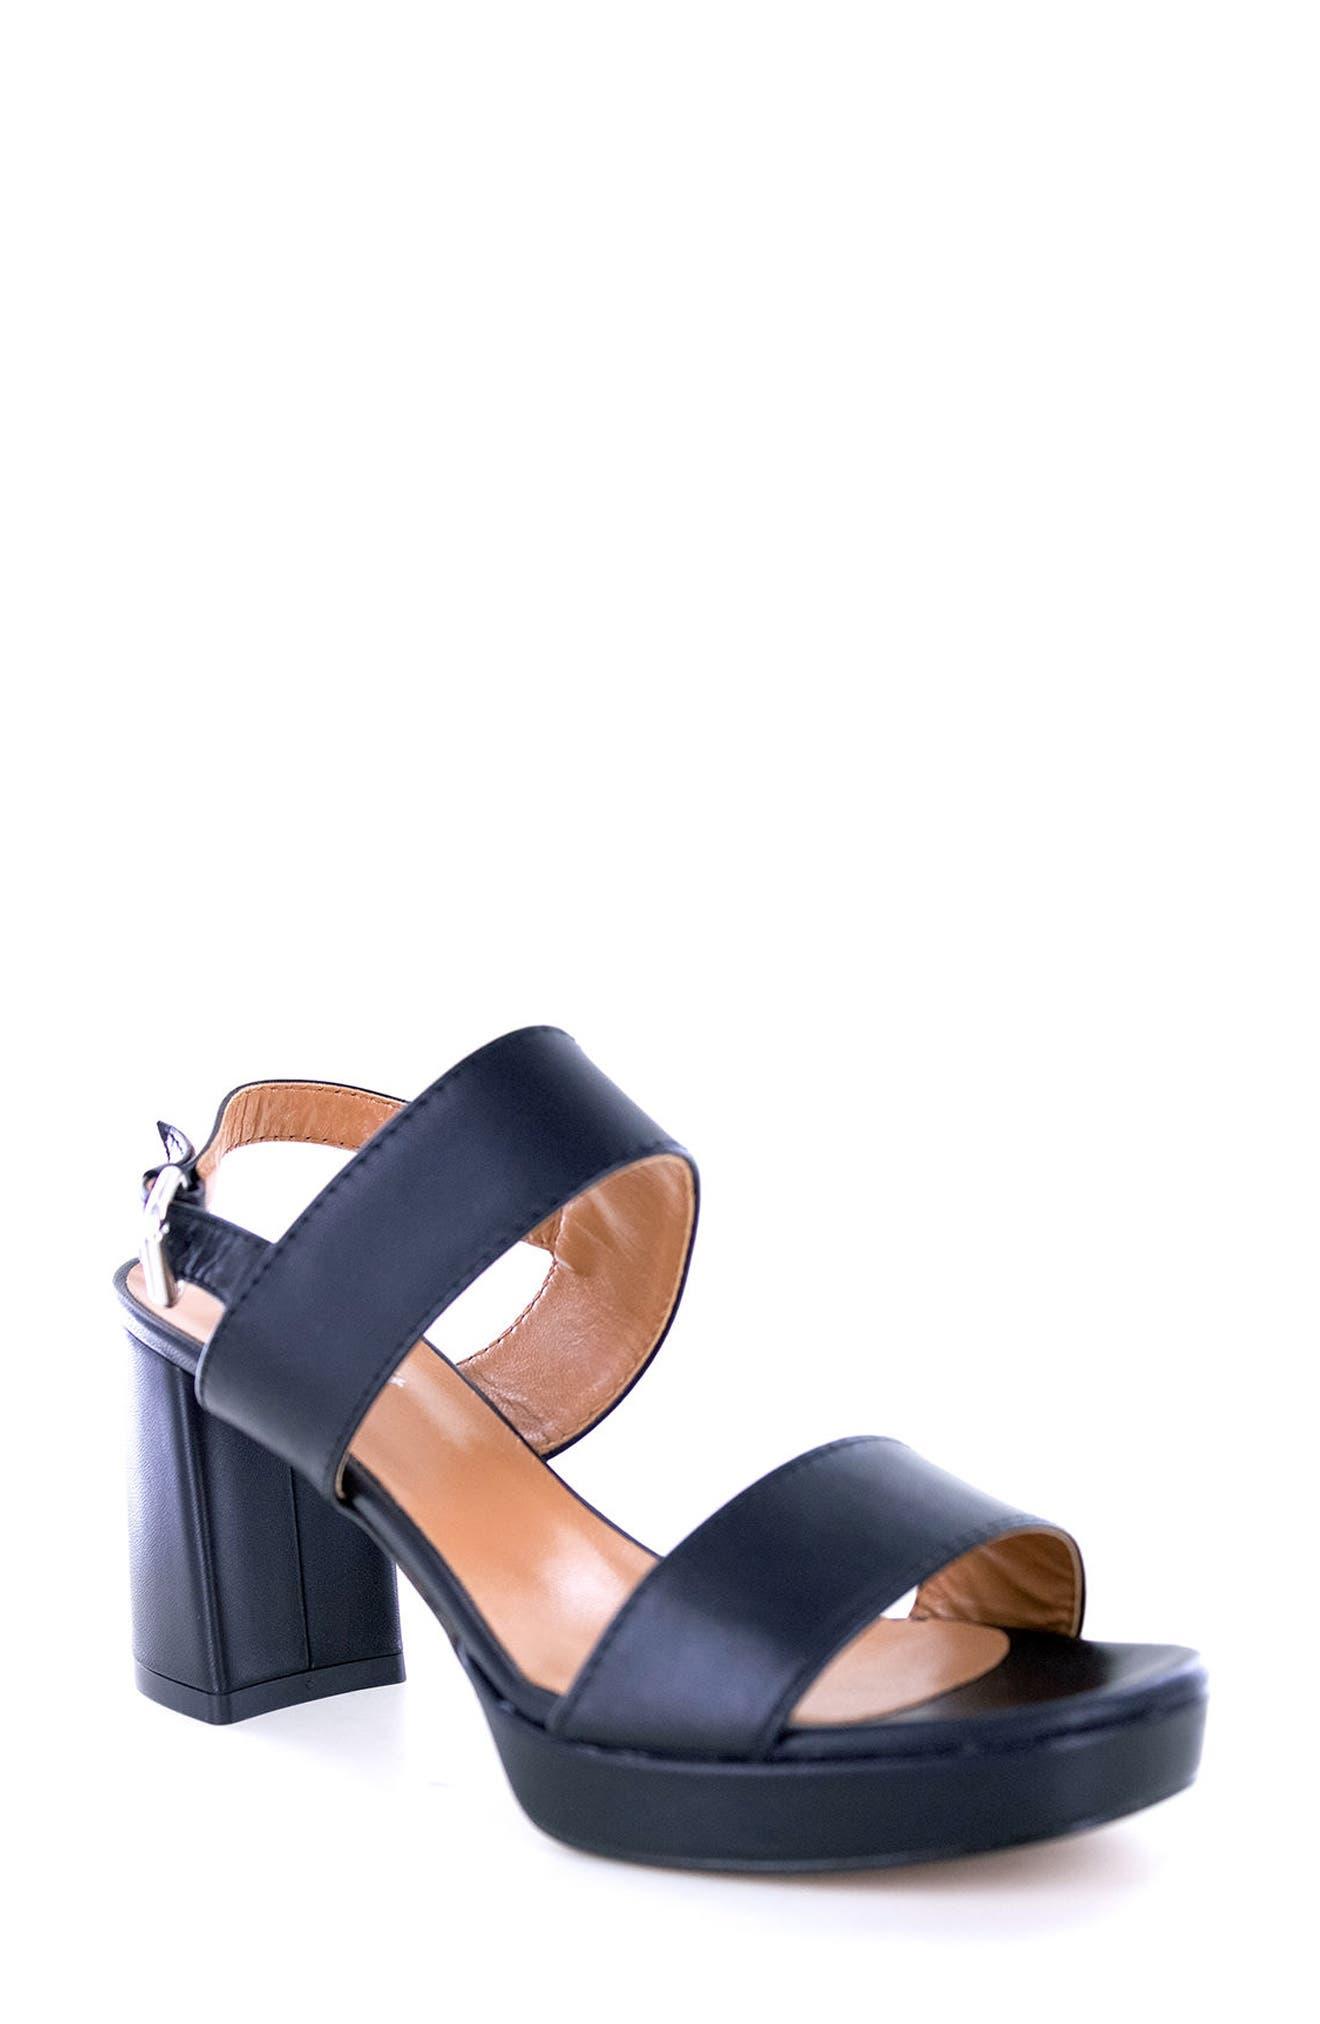 Summit Emilia Block Heel Sandal,                             Main thumbnail 1, color,